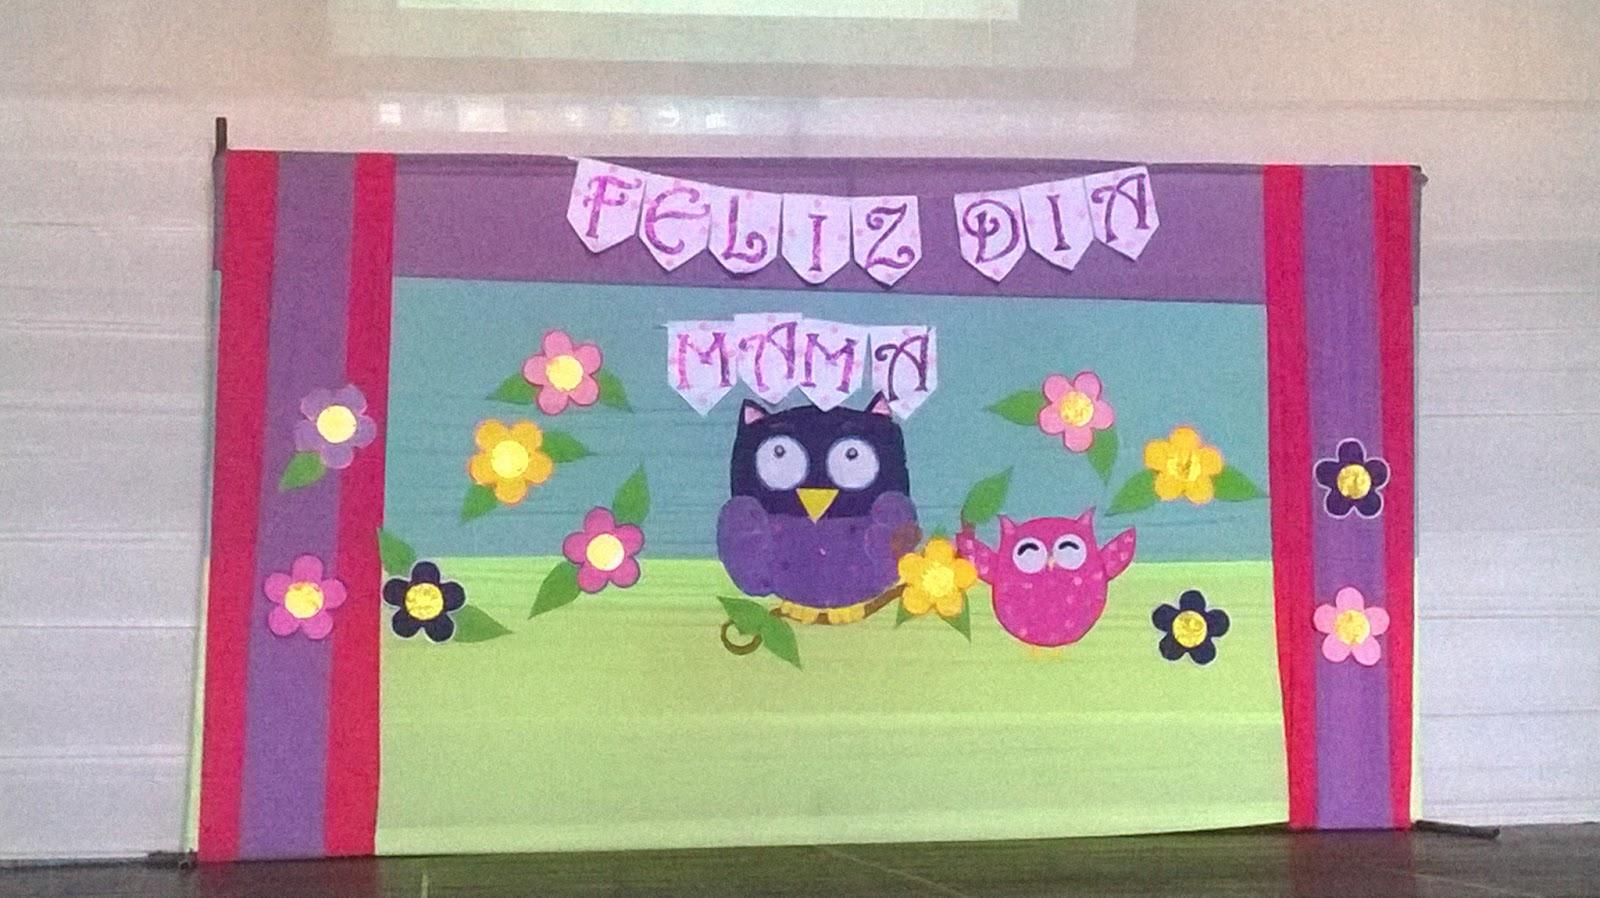 Ambientaci n para la celebracion del d a de la madre - Decoracion para el dia de la madre ...